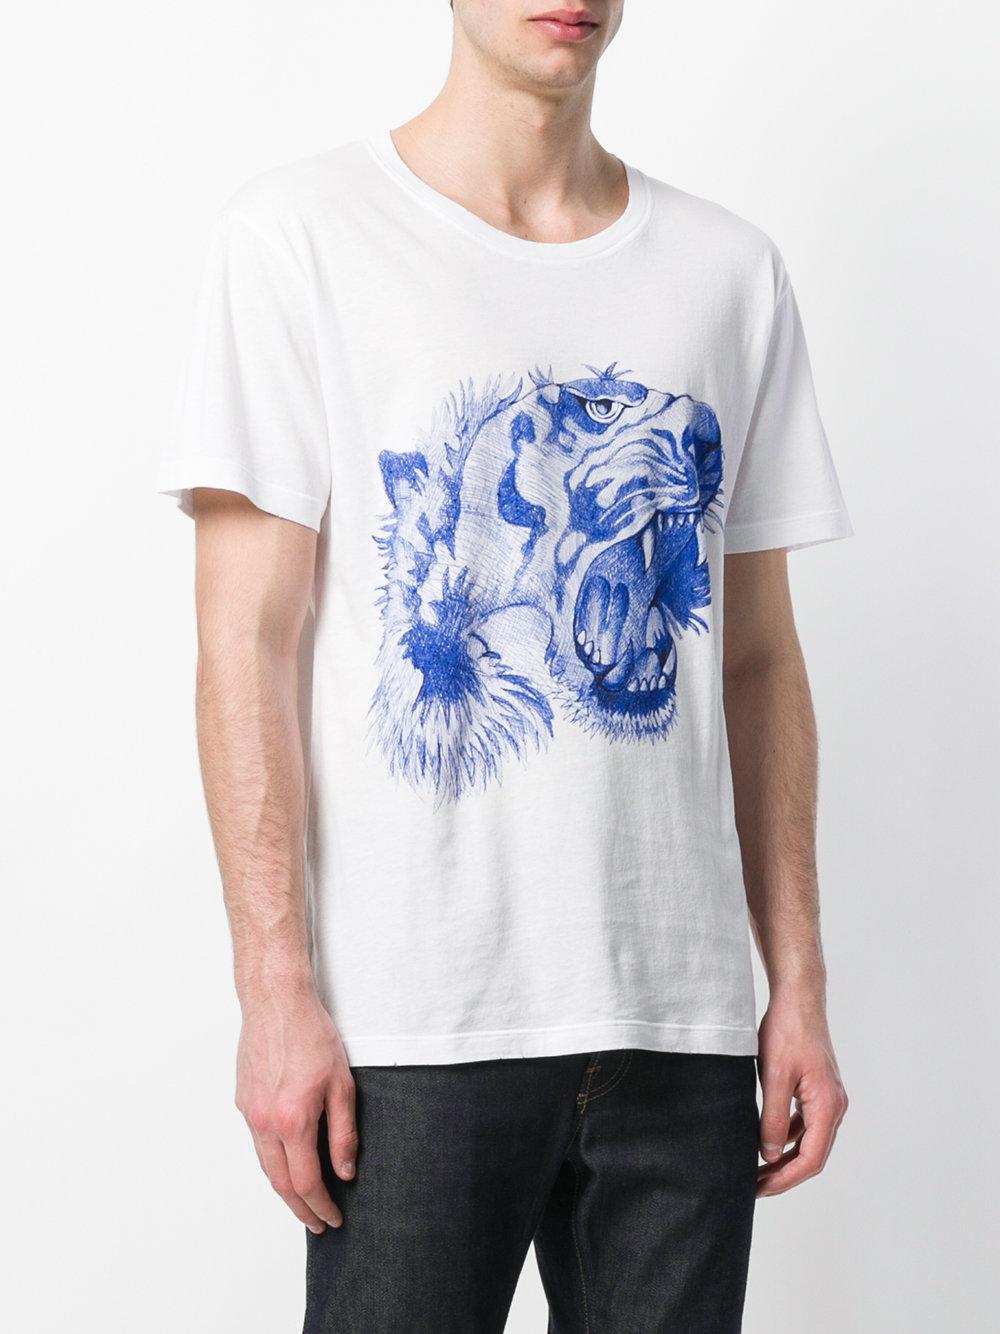 65f80cccdd6 Gucci - White Tiger s Head Print T-shirt for Men - Lyst. View fullscreen